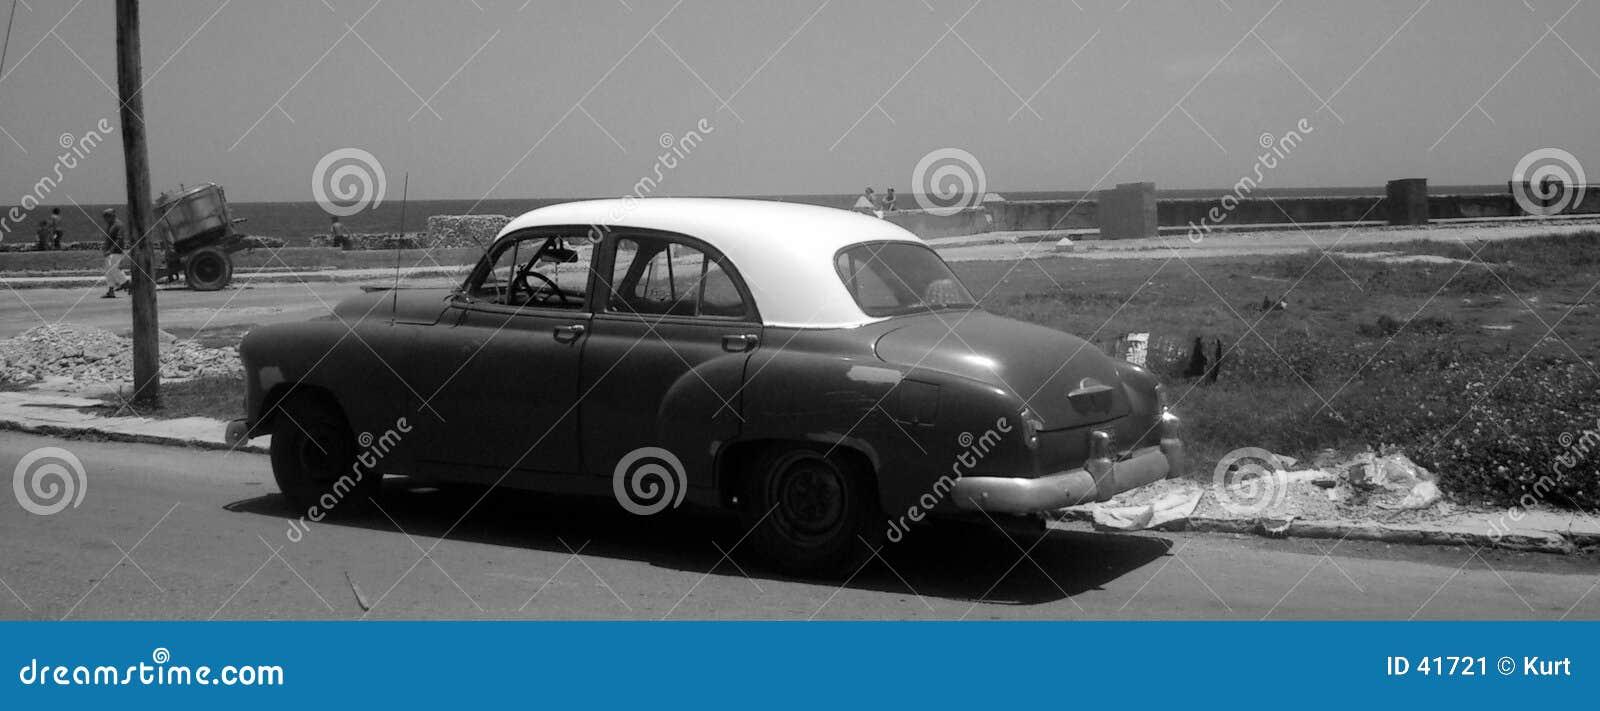 American fifties car